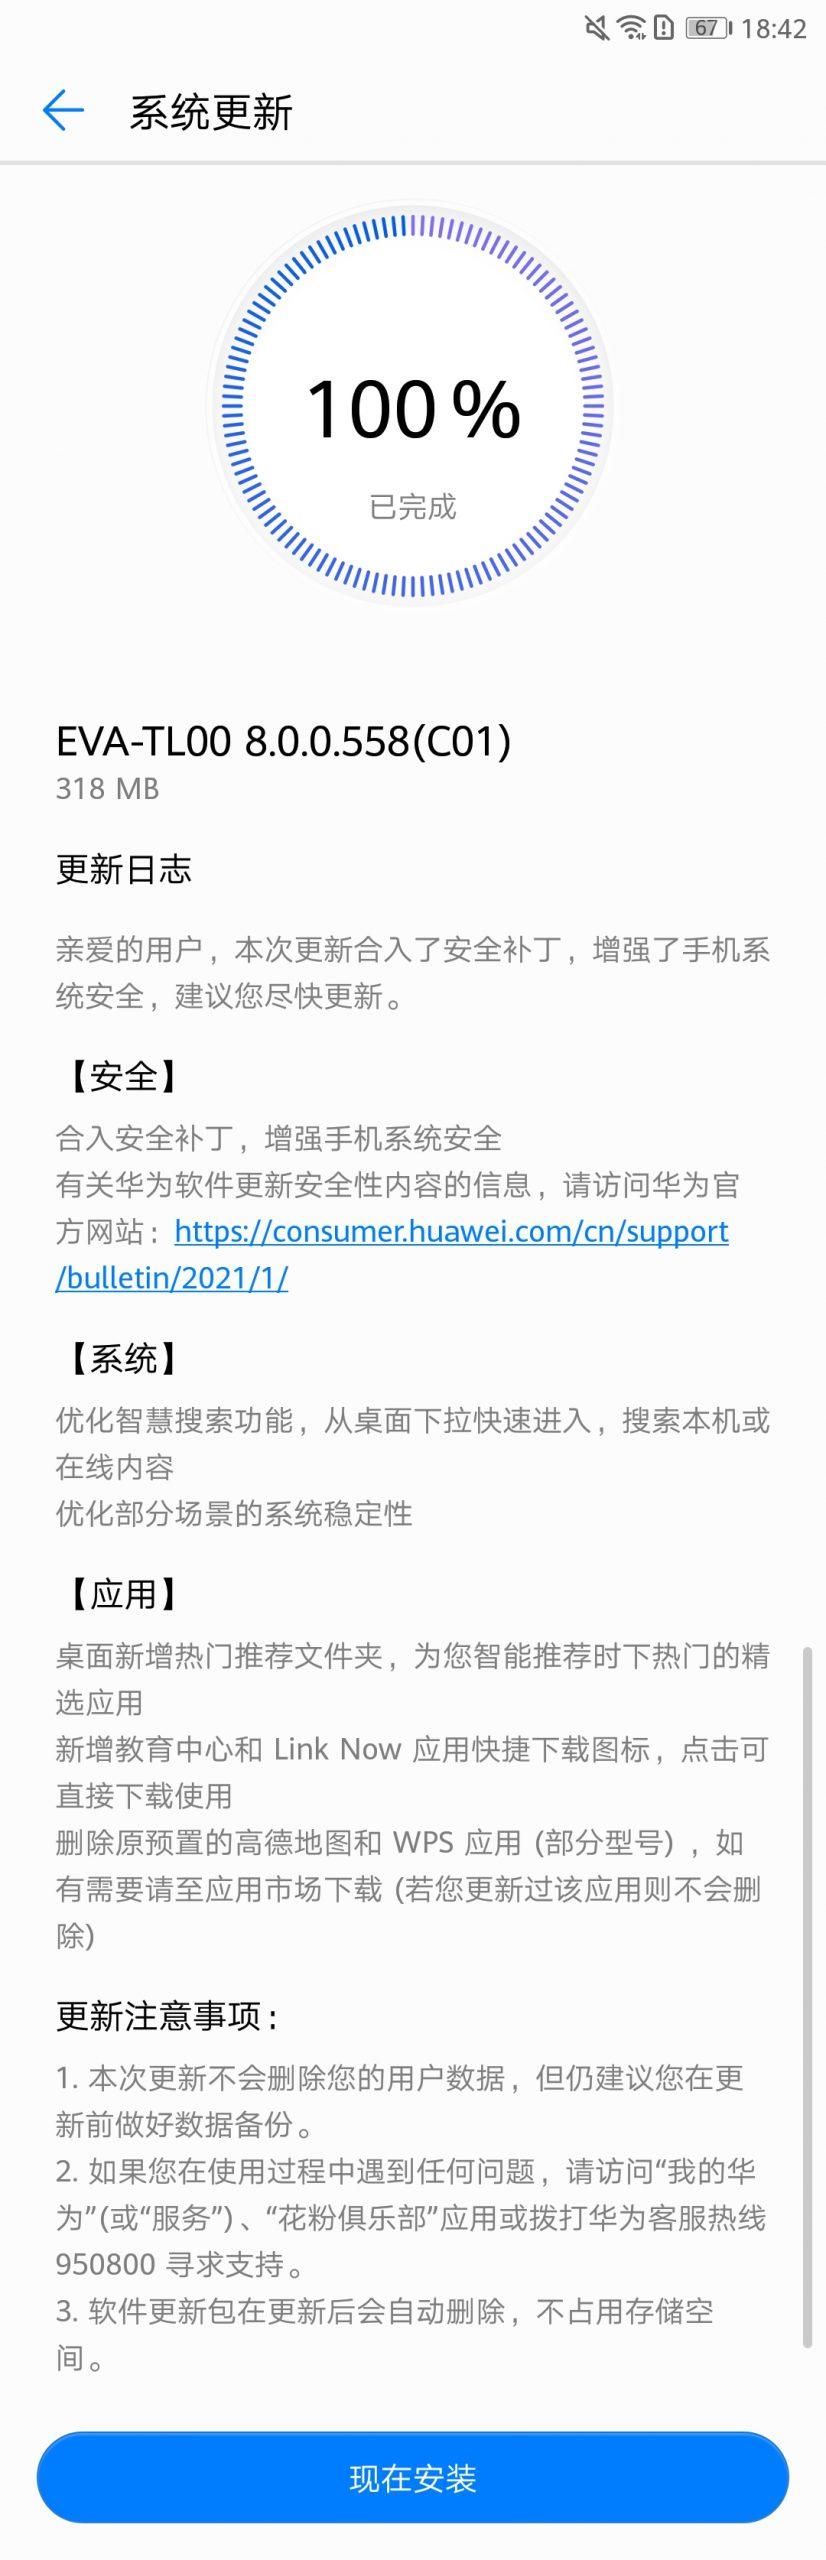 Huawei P9 getting EMUI 8.0.0.558